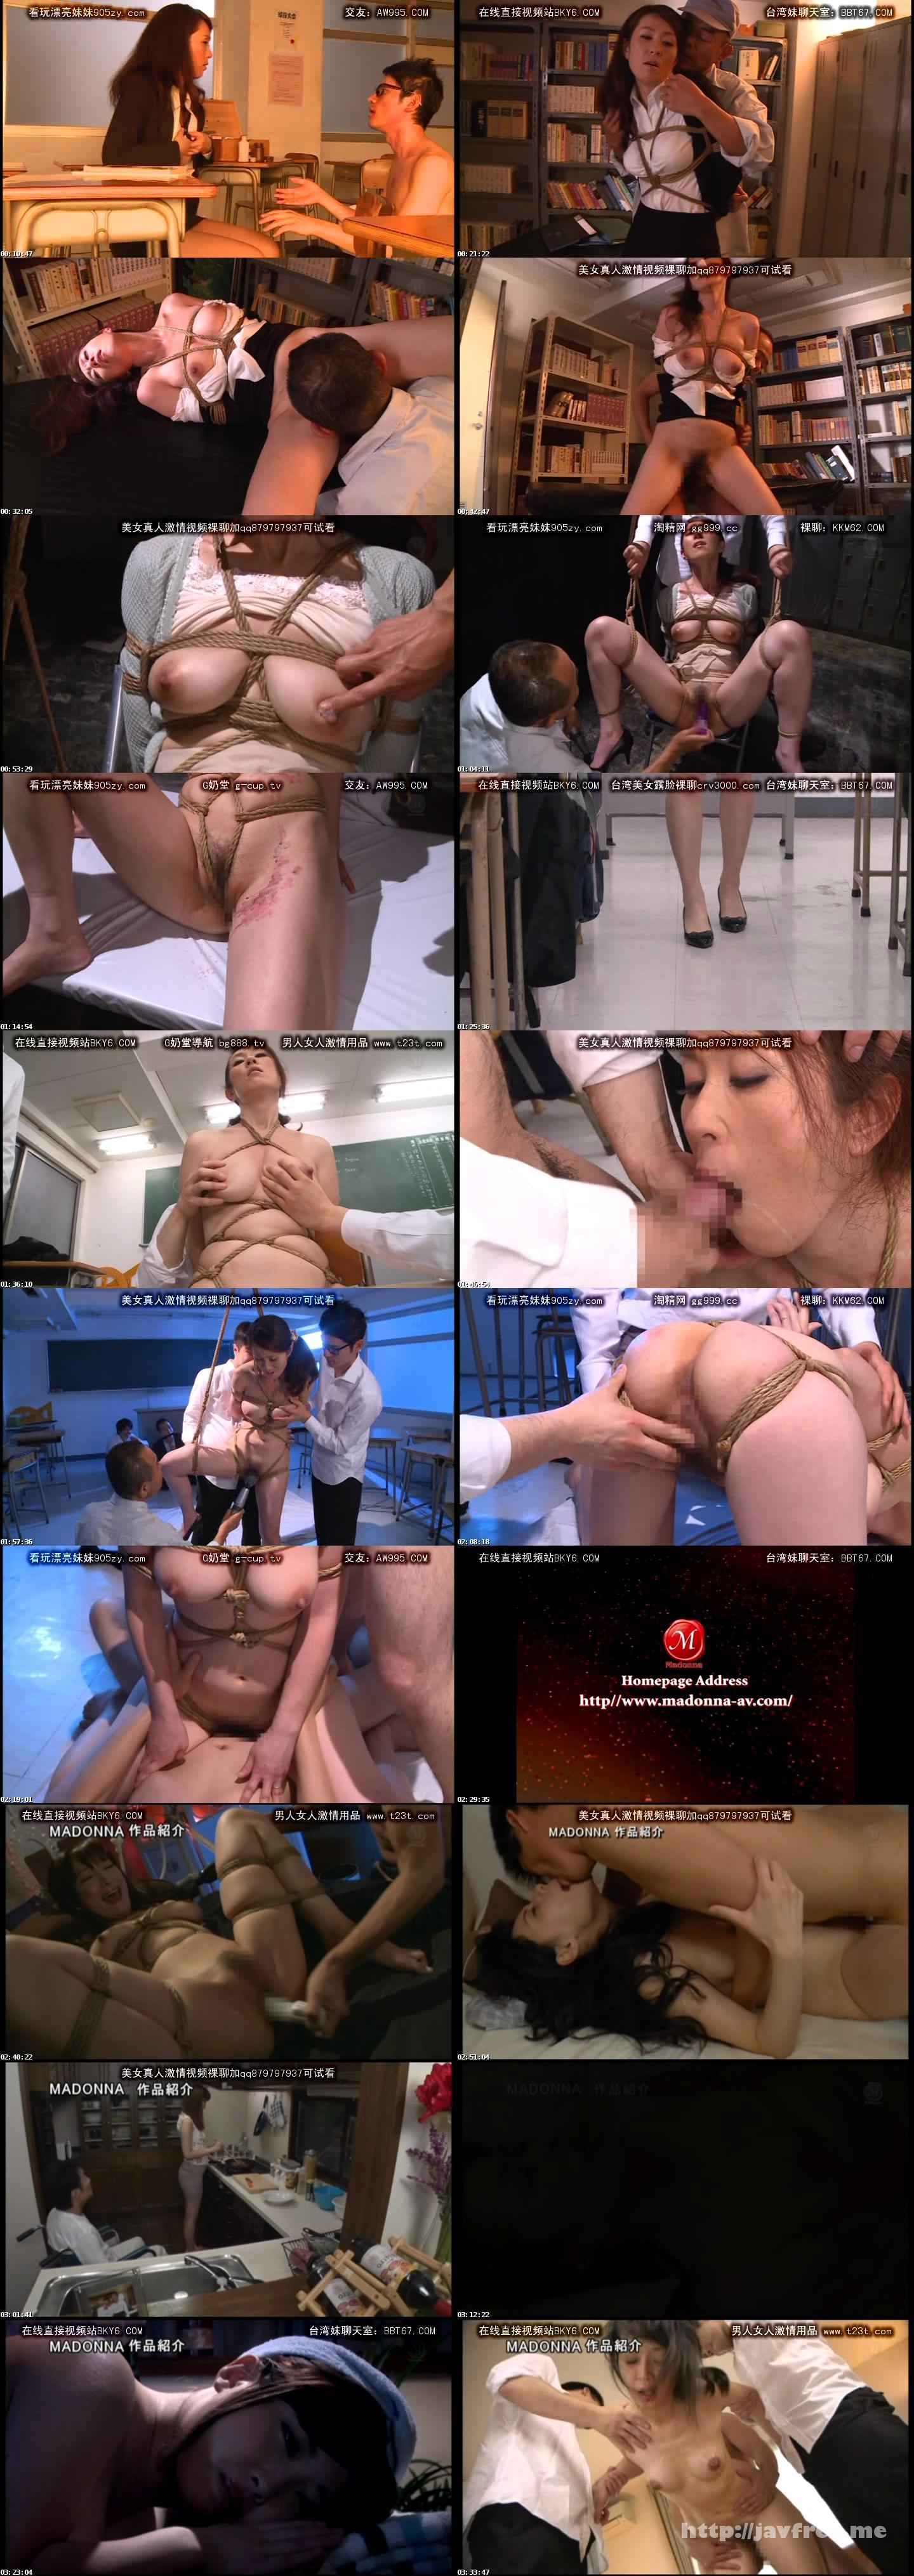 [JUX-756] 熟れた女教師 メス犬縛り 秋山静香 - image JUX-756 on https://javfree.me